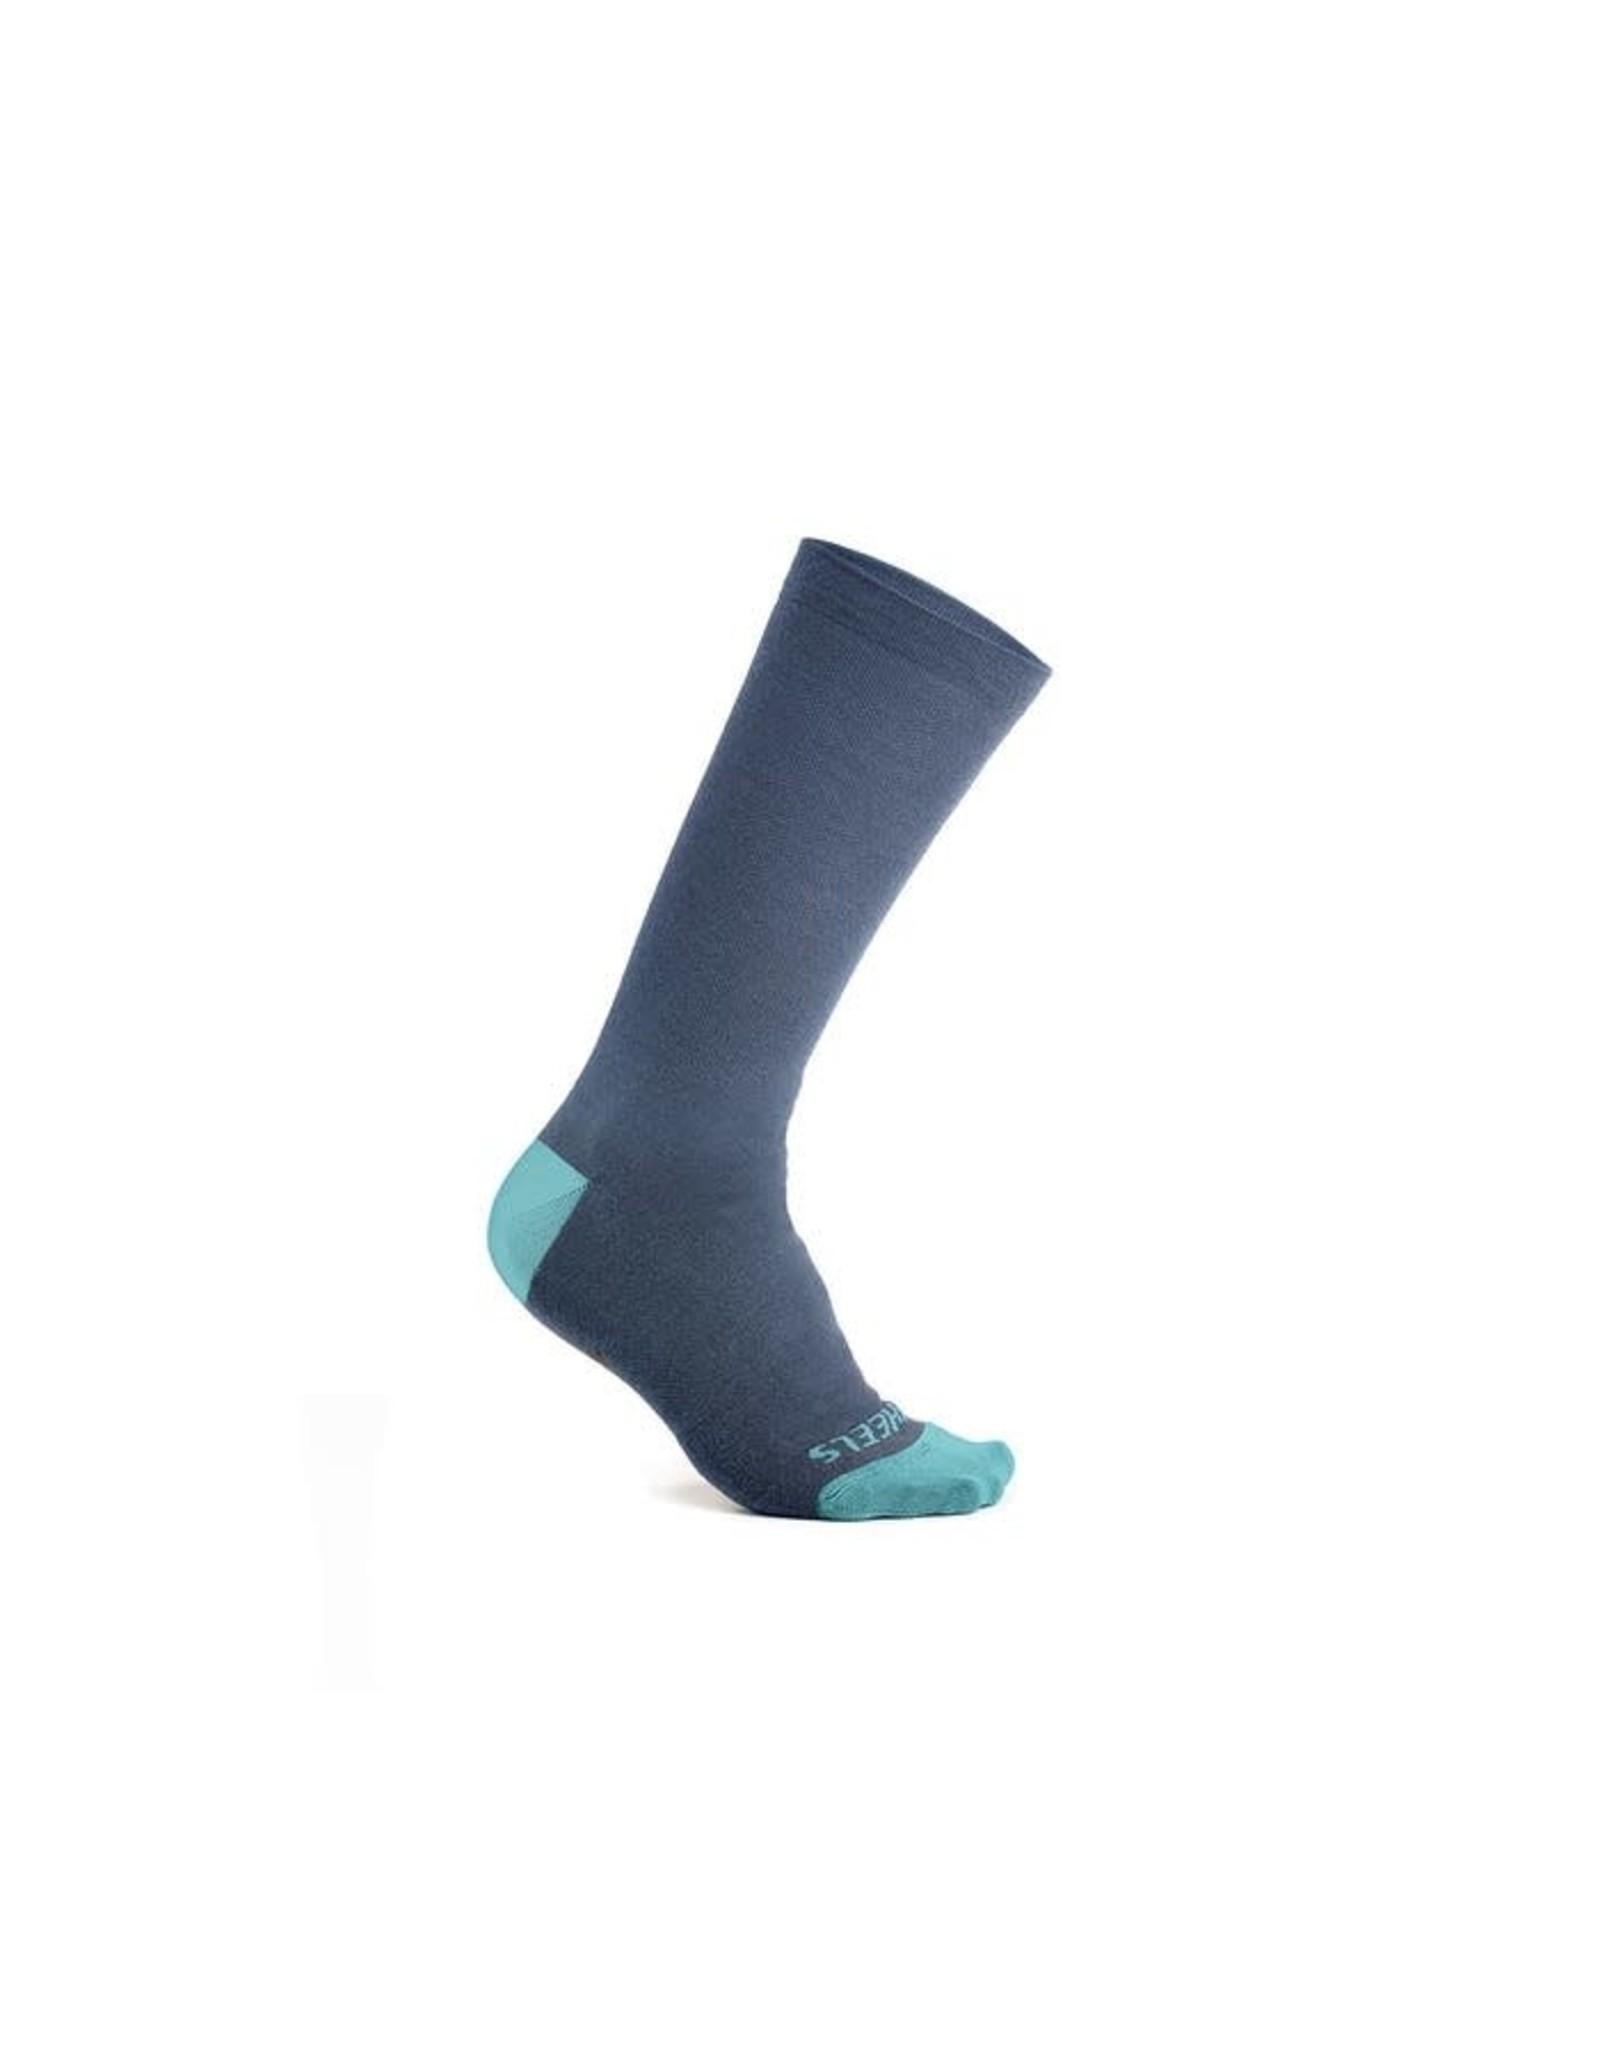 7MESH 7MESH - Ashlu Cadet Blue Merino Sock Med